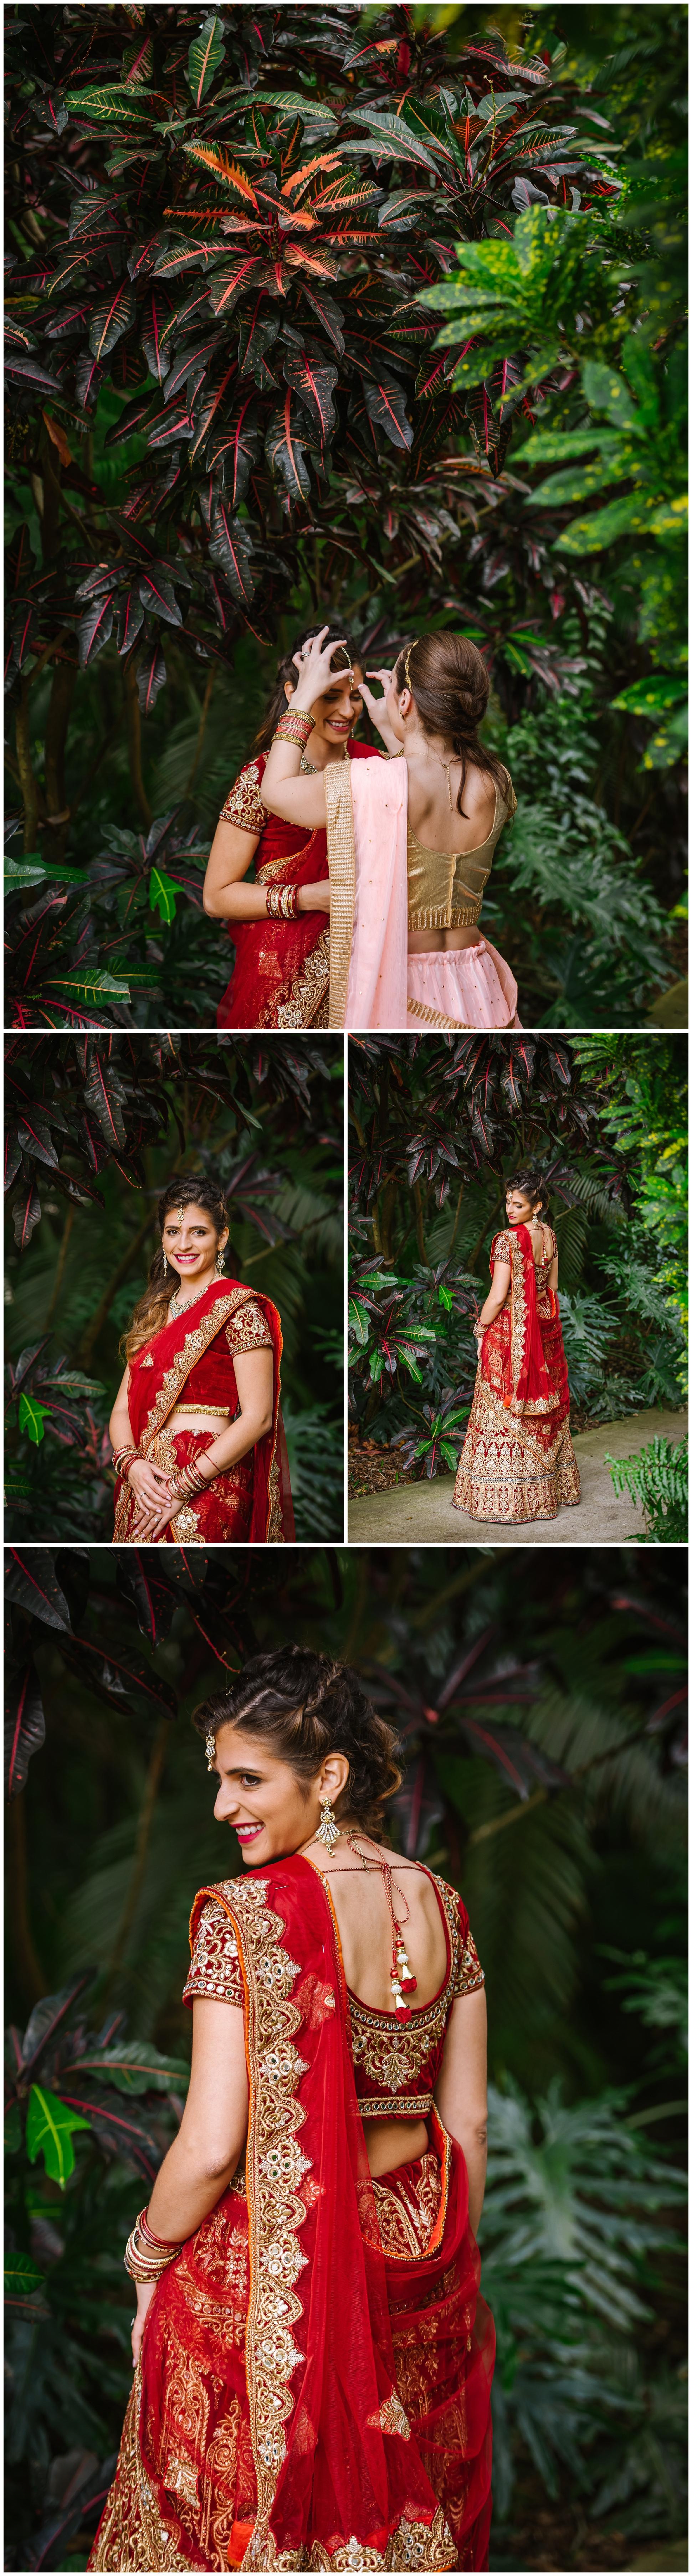 St-pete-indian-wedding-photographer-barat-sunken-gardens_0077.jpg